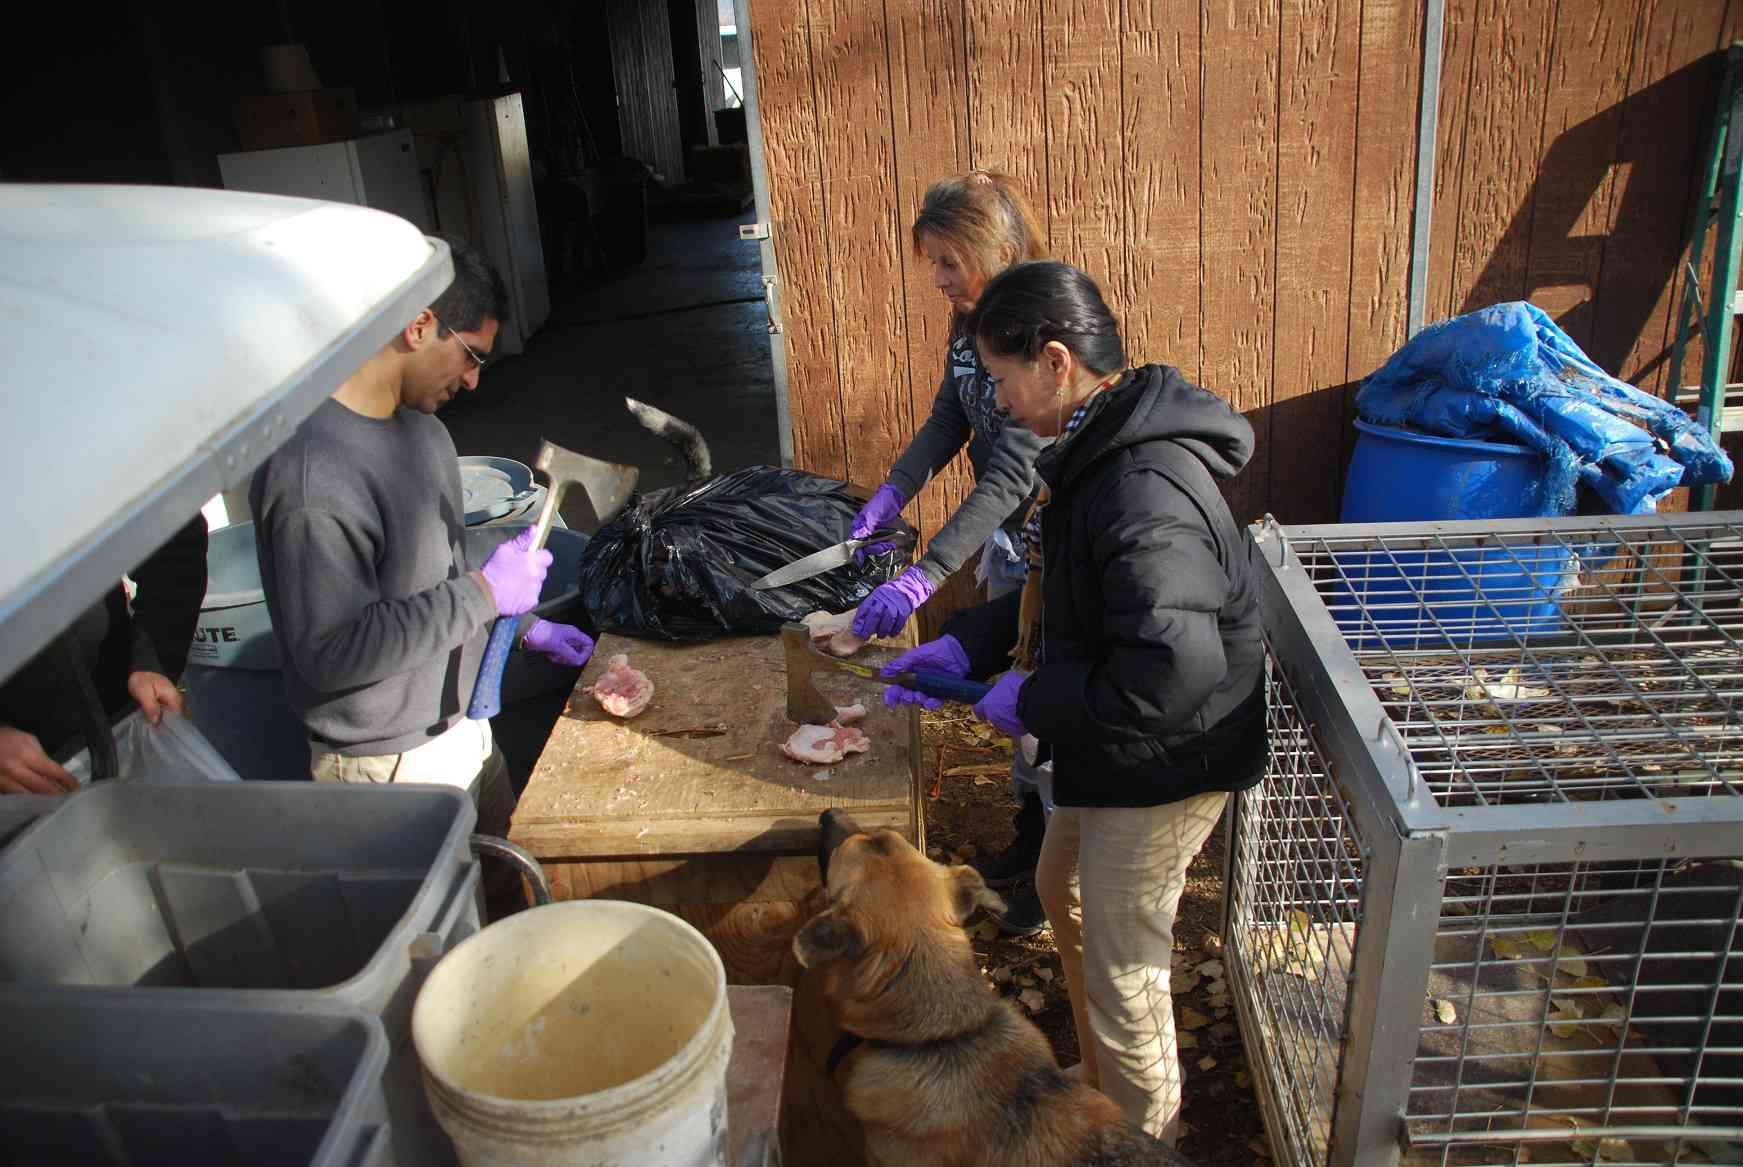 LARC volunteers cut up raw meat